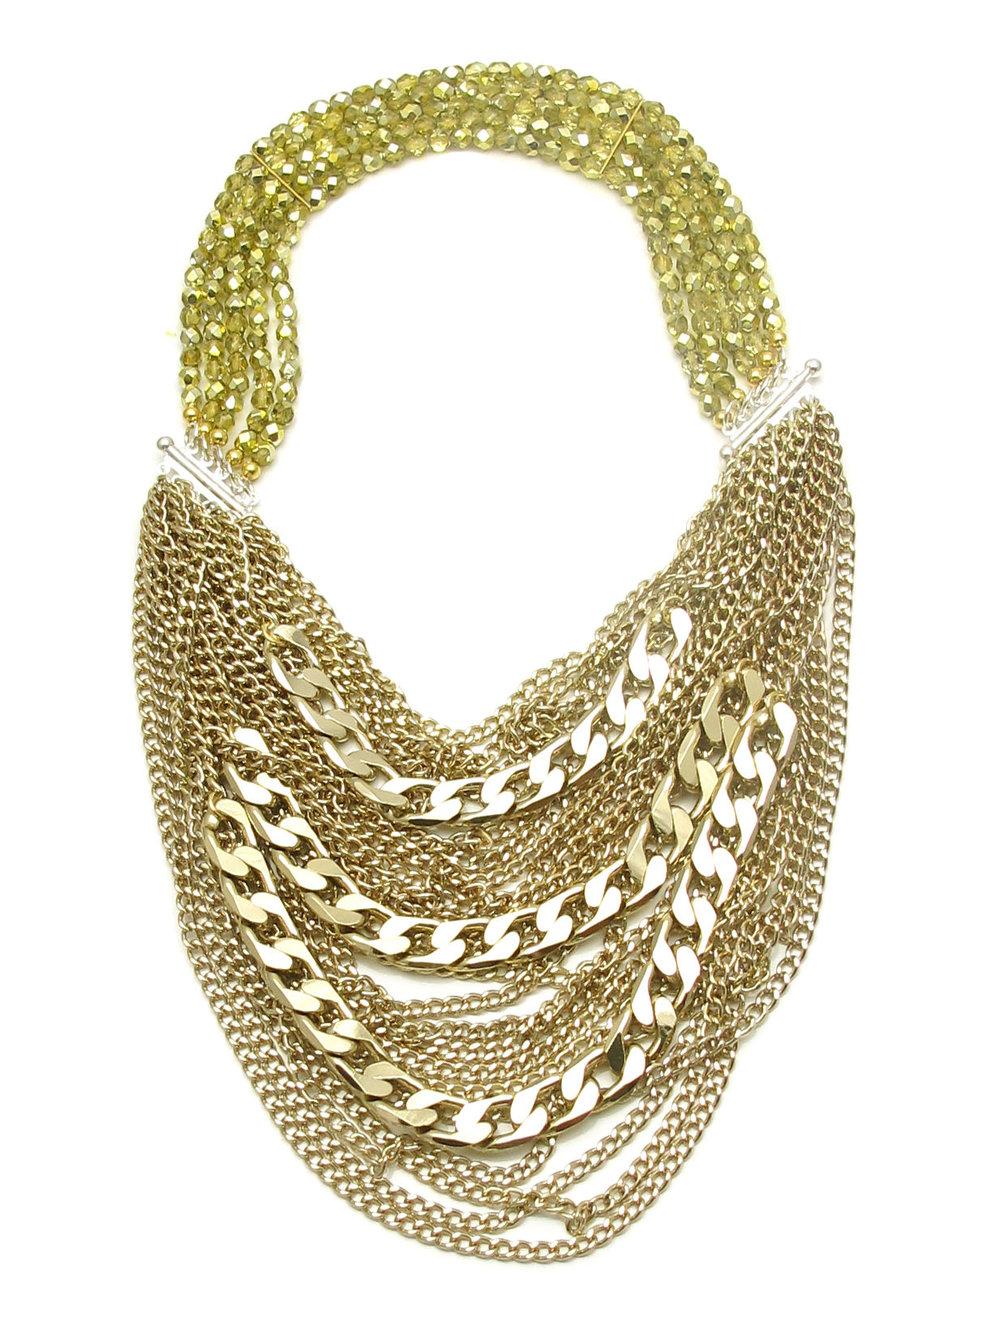 012G Gold Chain Bib.jpg